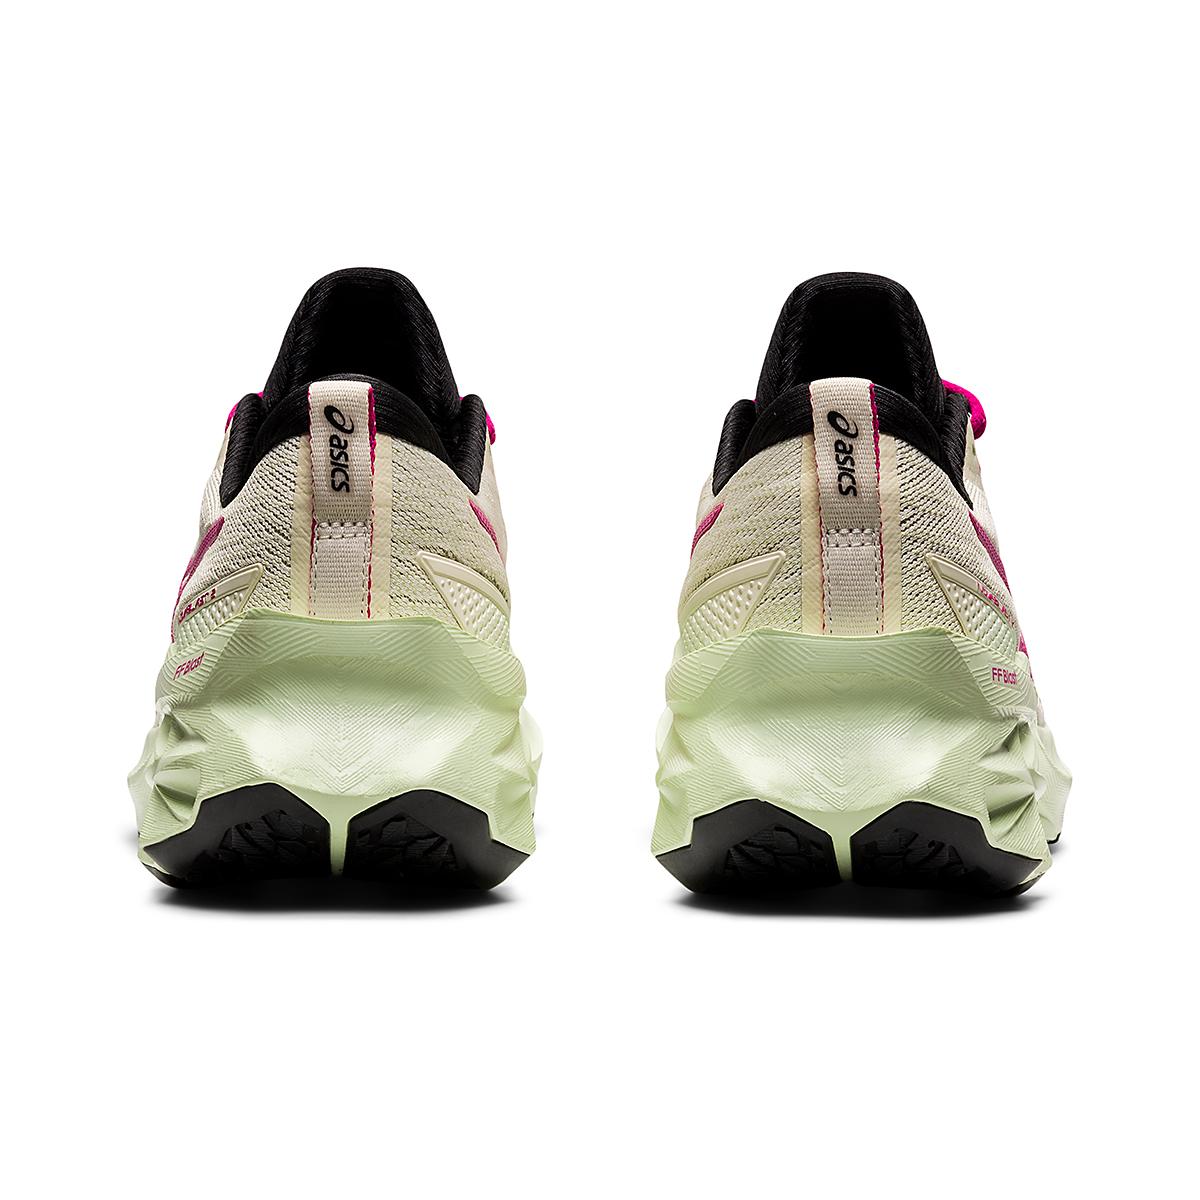 Women's Asics Novablast 2 Running Shoe - Color: Birch/Pink Rave - Size: 5 - Width: Regular, Birch/Pink Rave, large, image 5